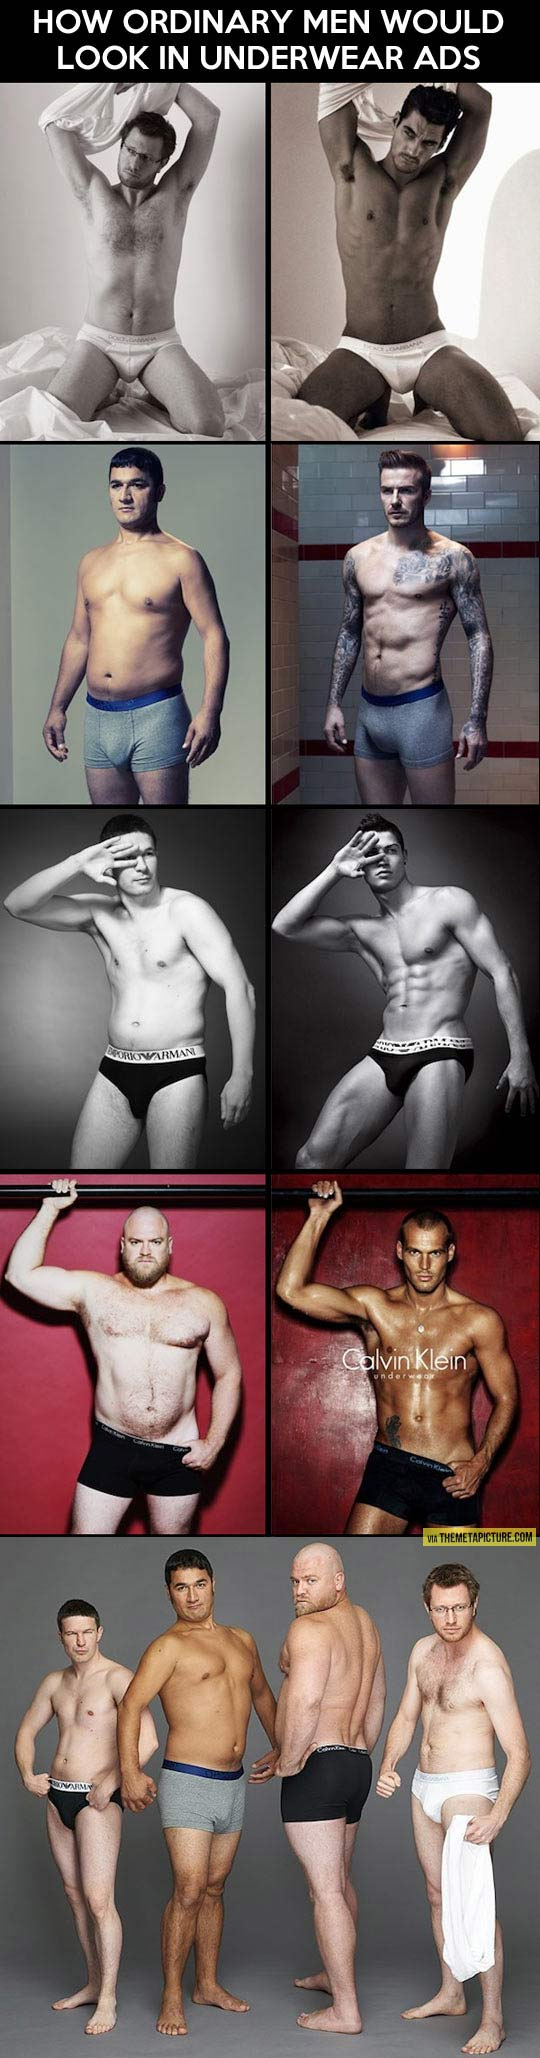 Ordinary men in underwear ads…